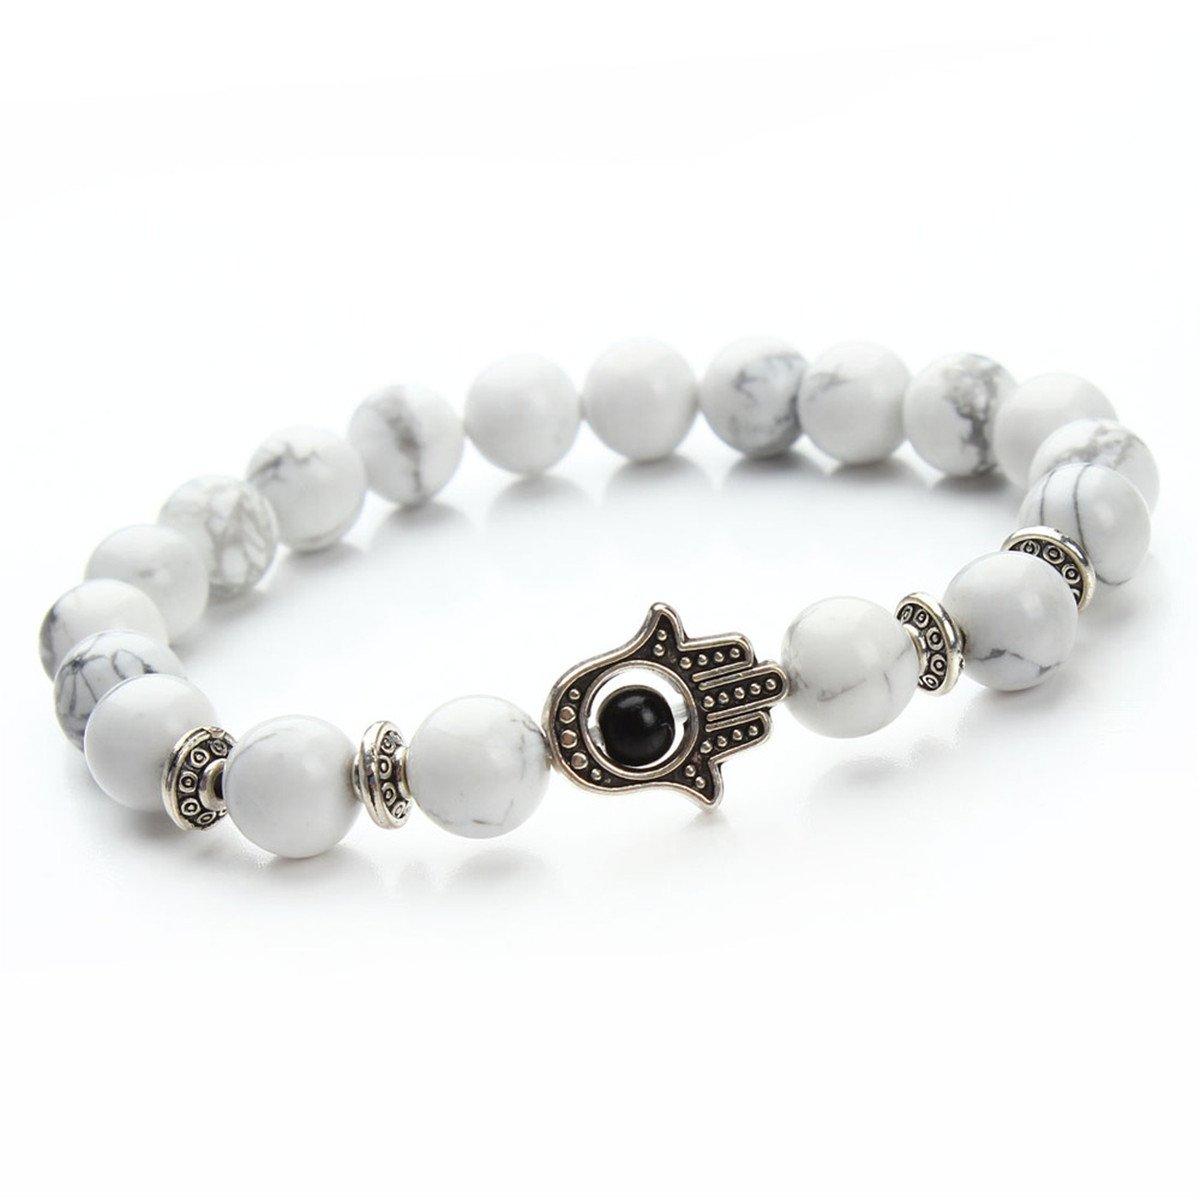 Natural Stone Lava Beads Bracelet Matte Energy Yoga Mala Bracelets With Hamsa Hand Charm XO 11937